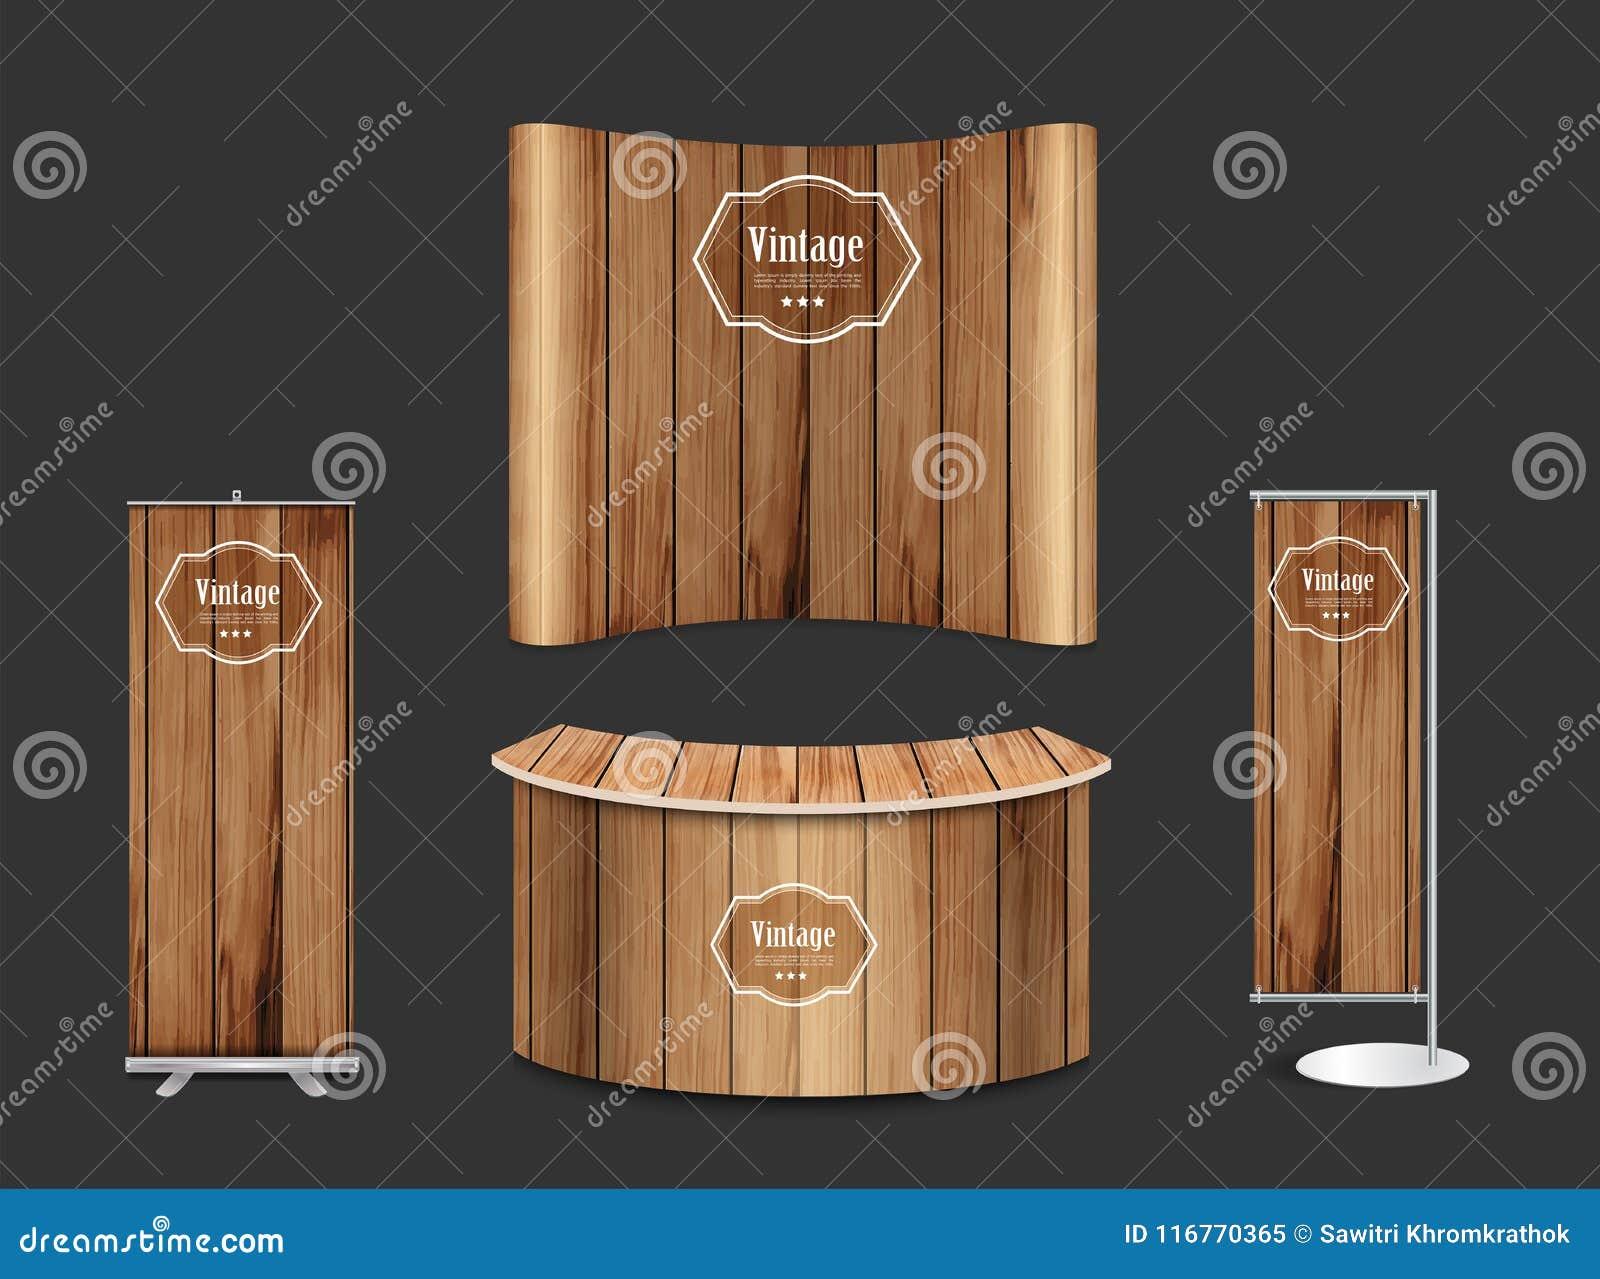 Exhibition Stand Design Mockup Free : Creative exhibition stand display design info stock vector